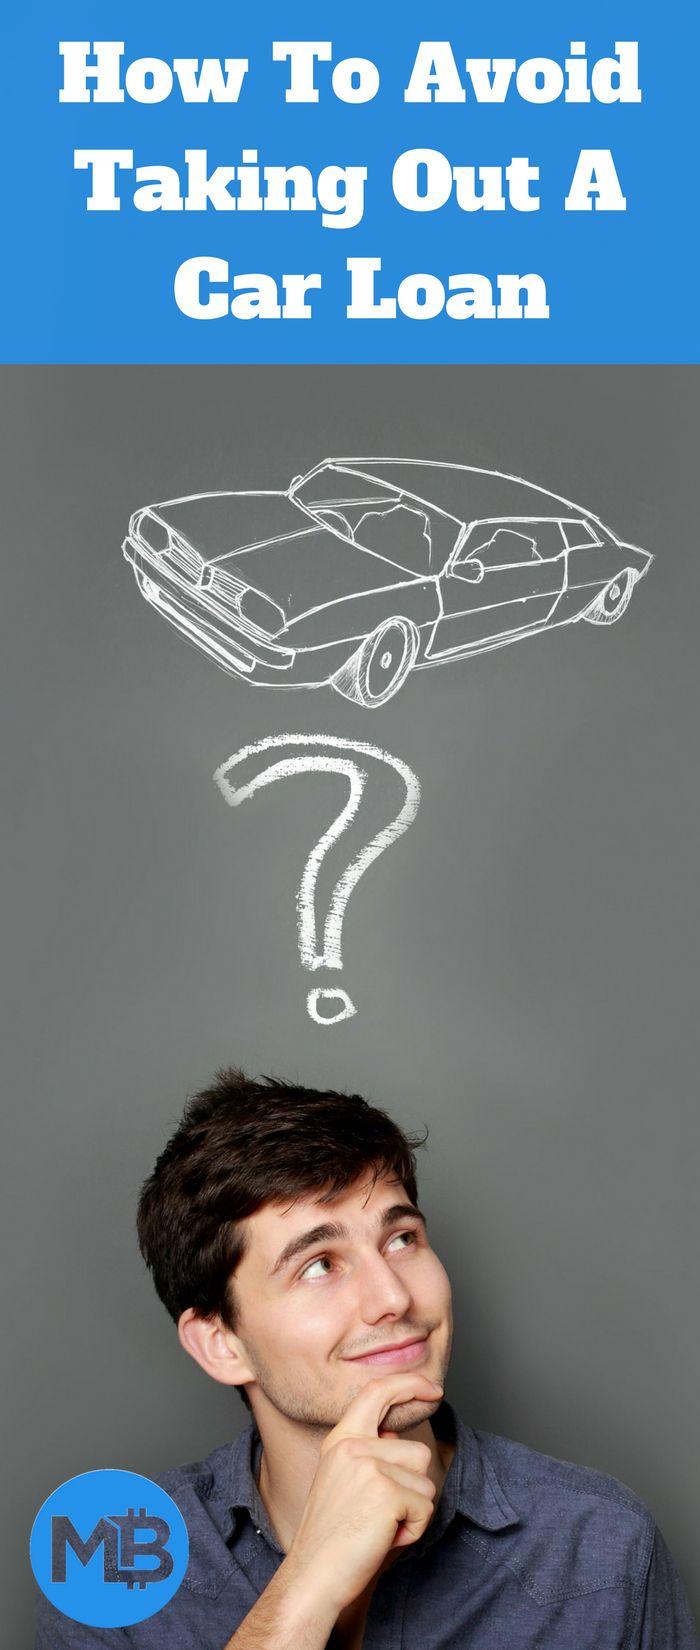 Car loan tips car loans avoid taking out car loan getting a car